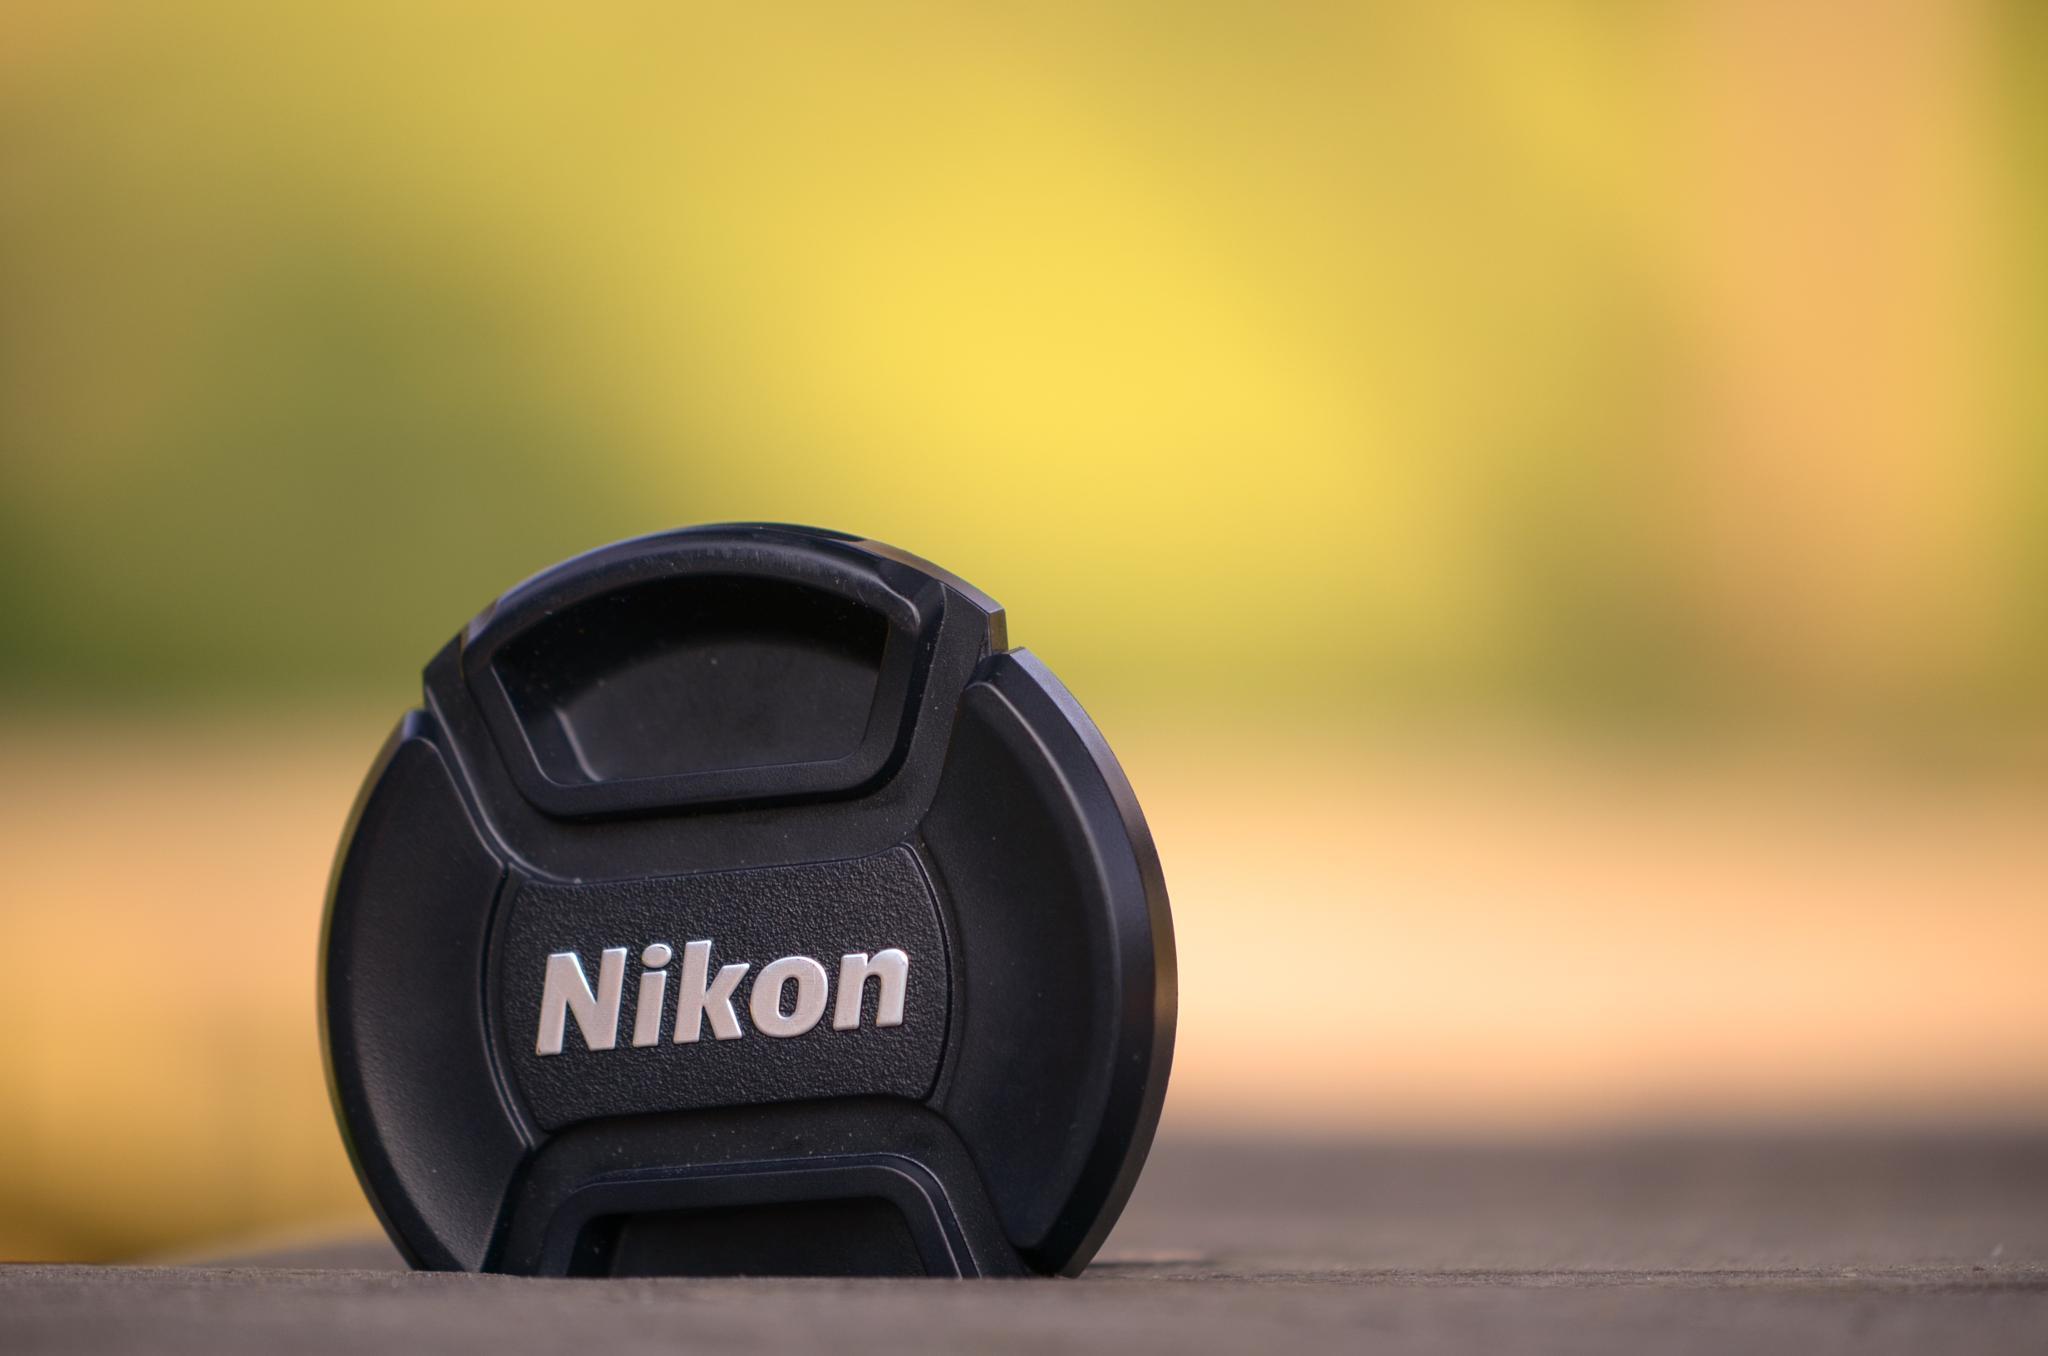 Nikon by Saly.Wanli